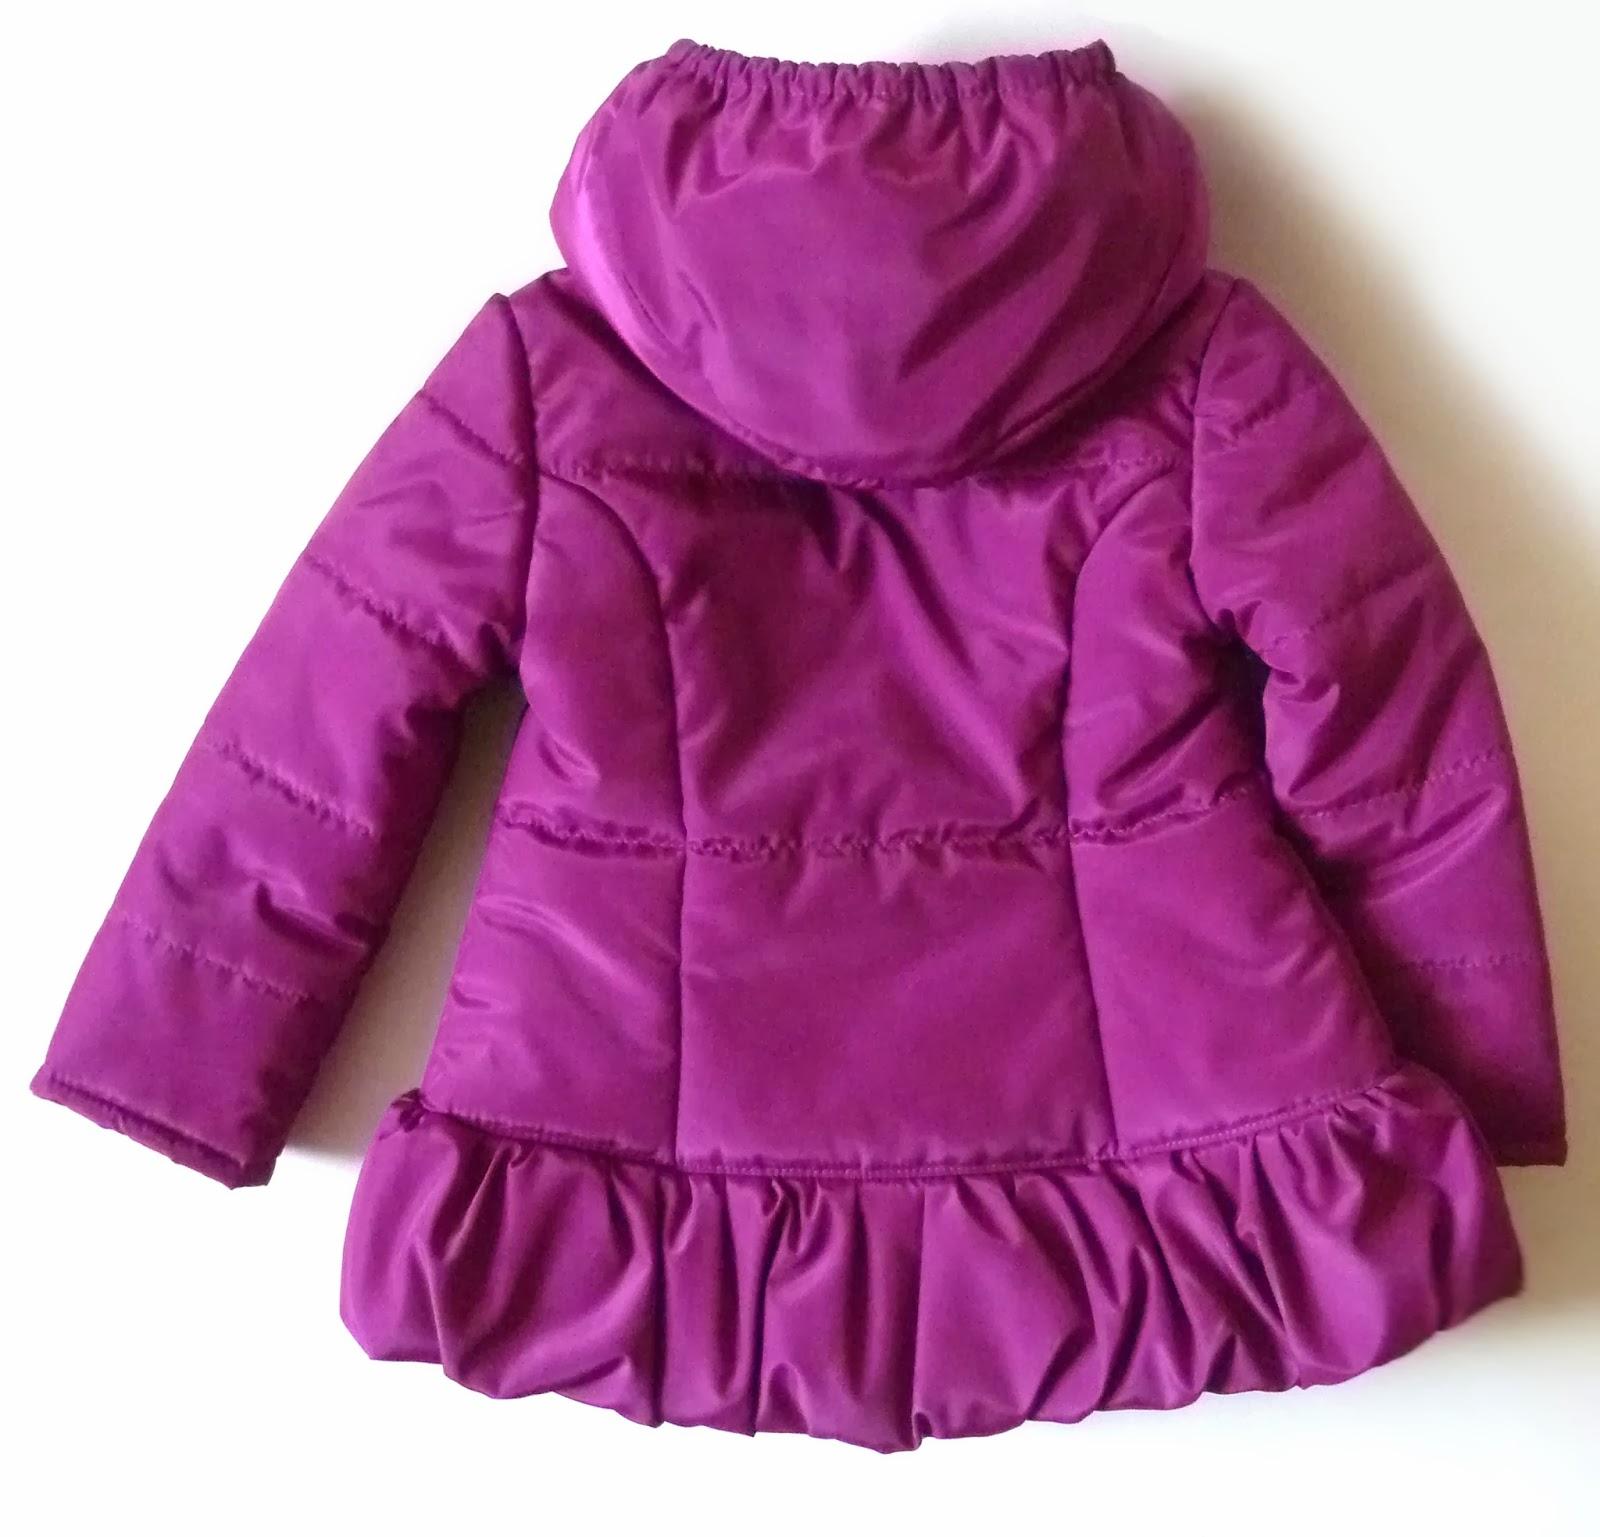 Сшить куртку для девочки фото